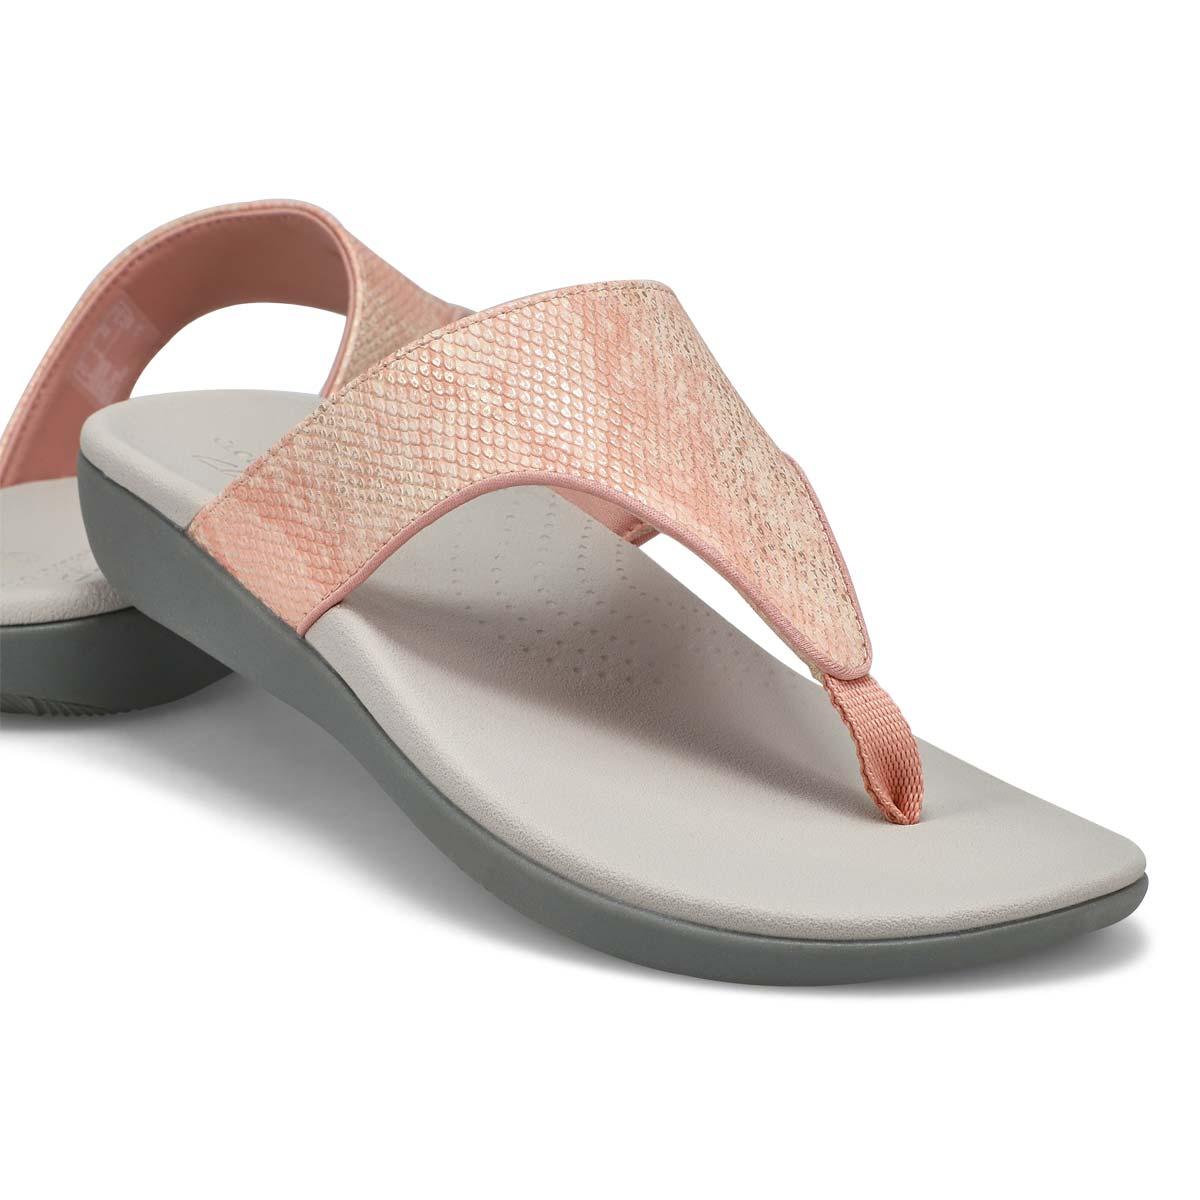 Women's Brio Vibe Thong Sandal - Rose Gold Snake